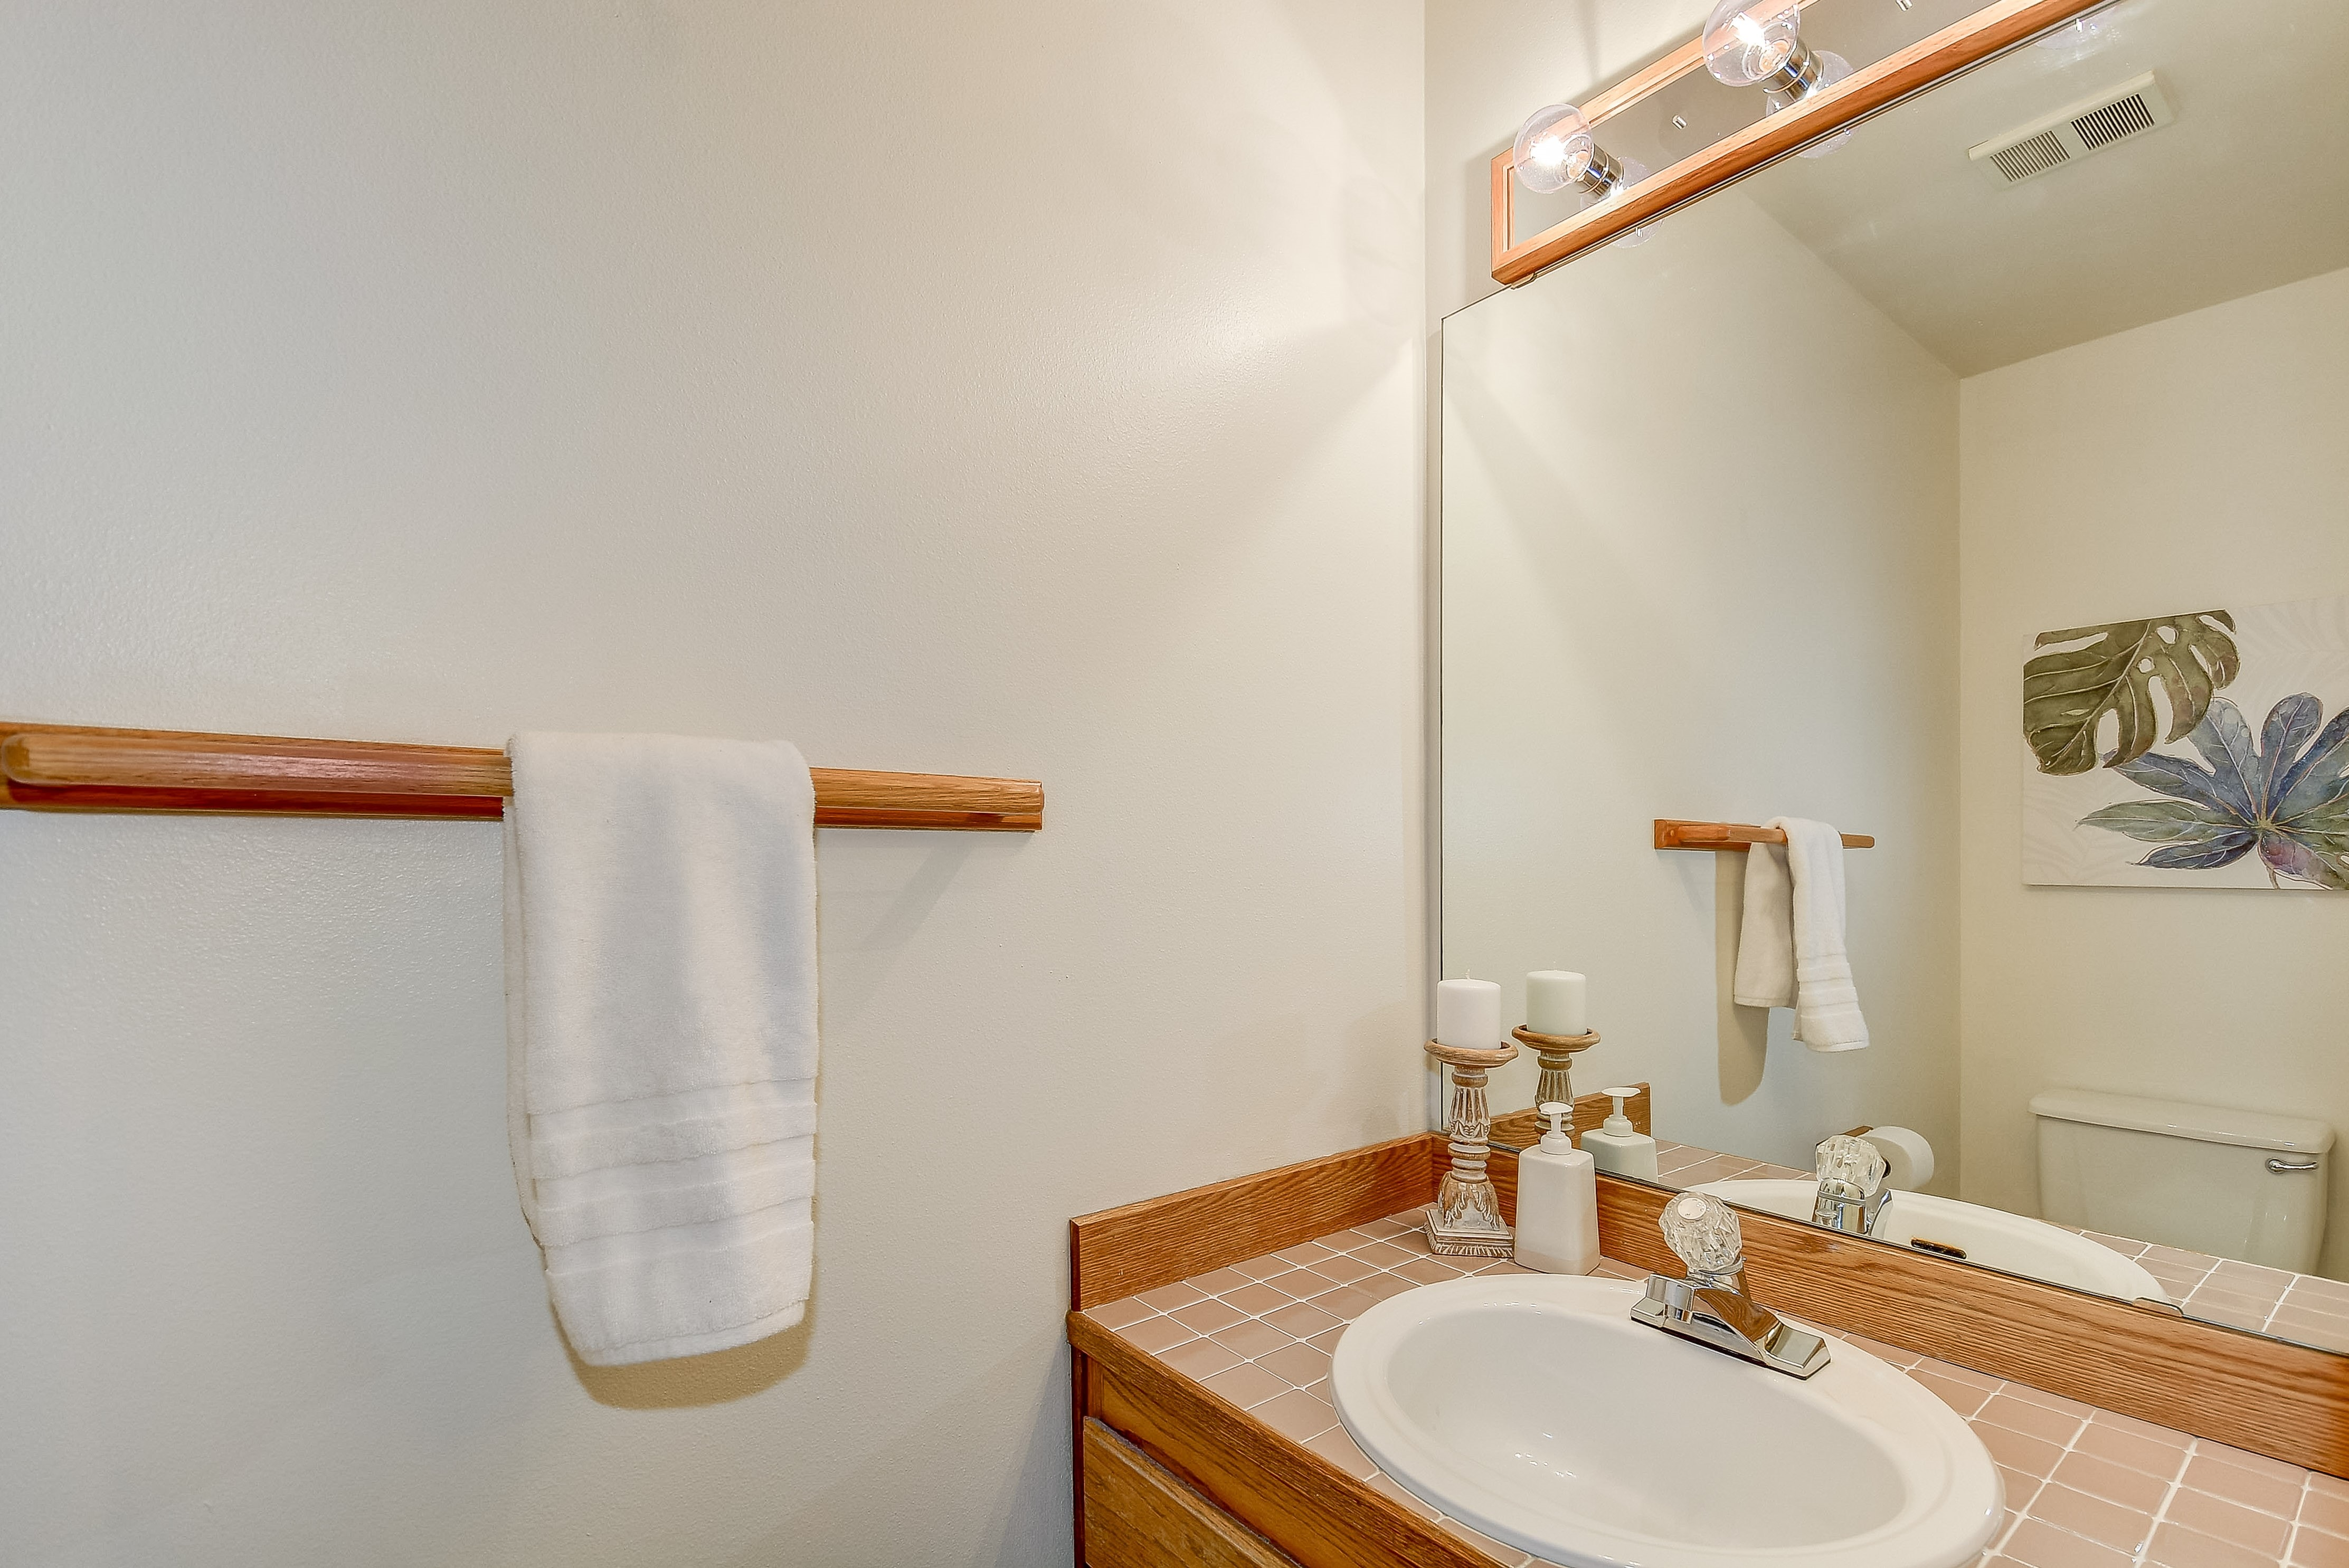 008_Half Bath Room